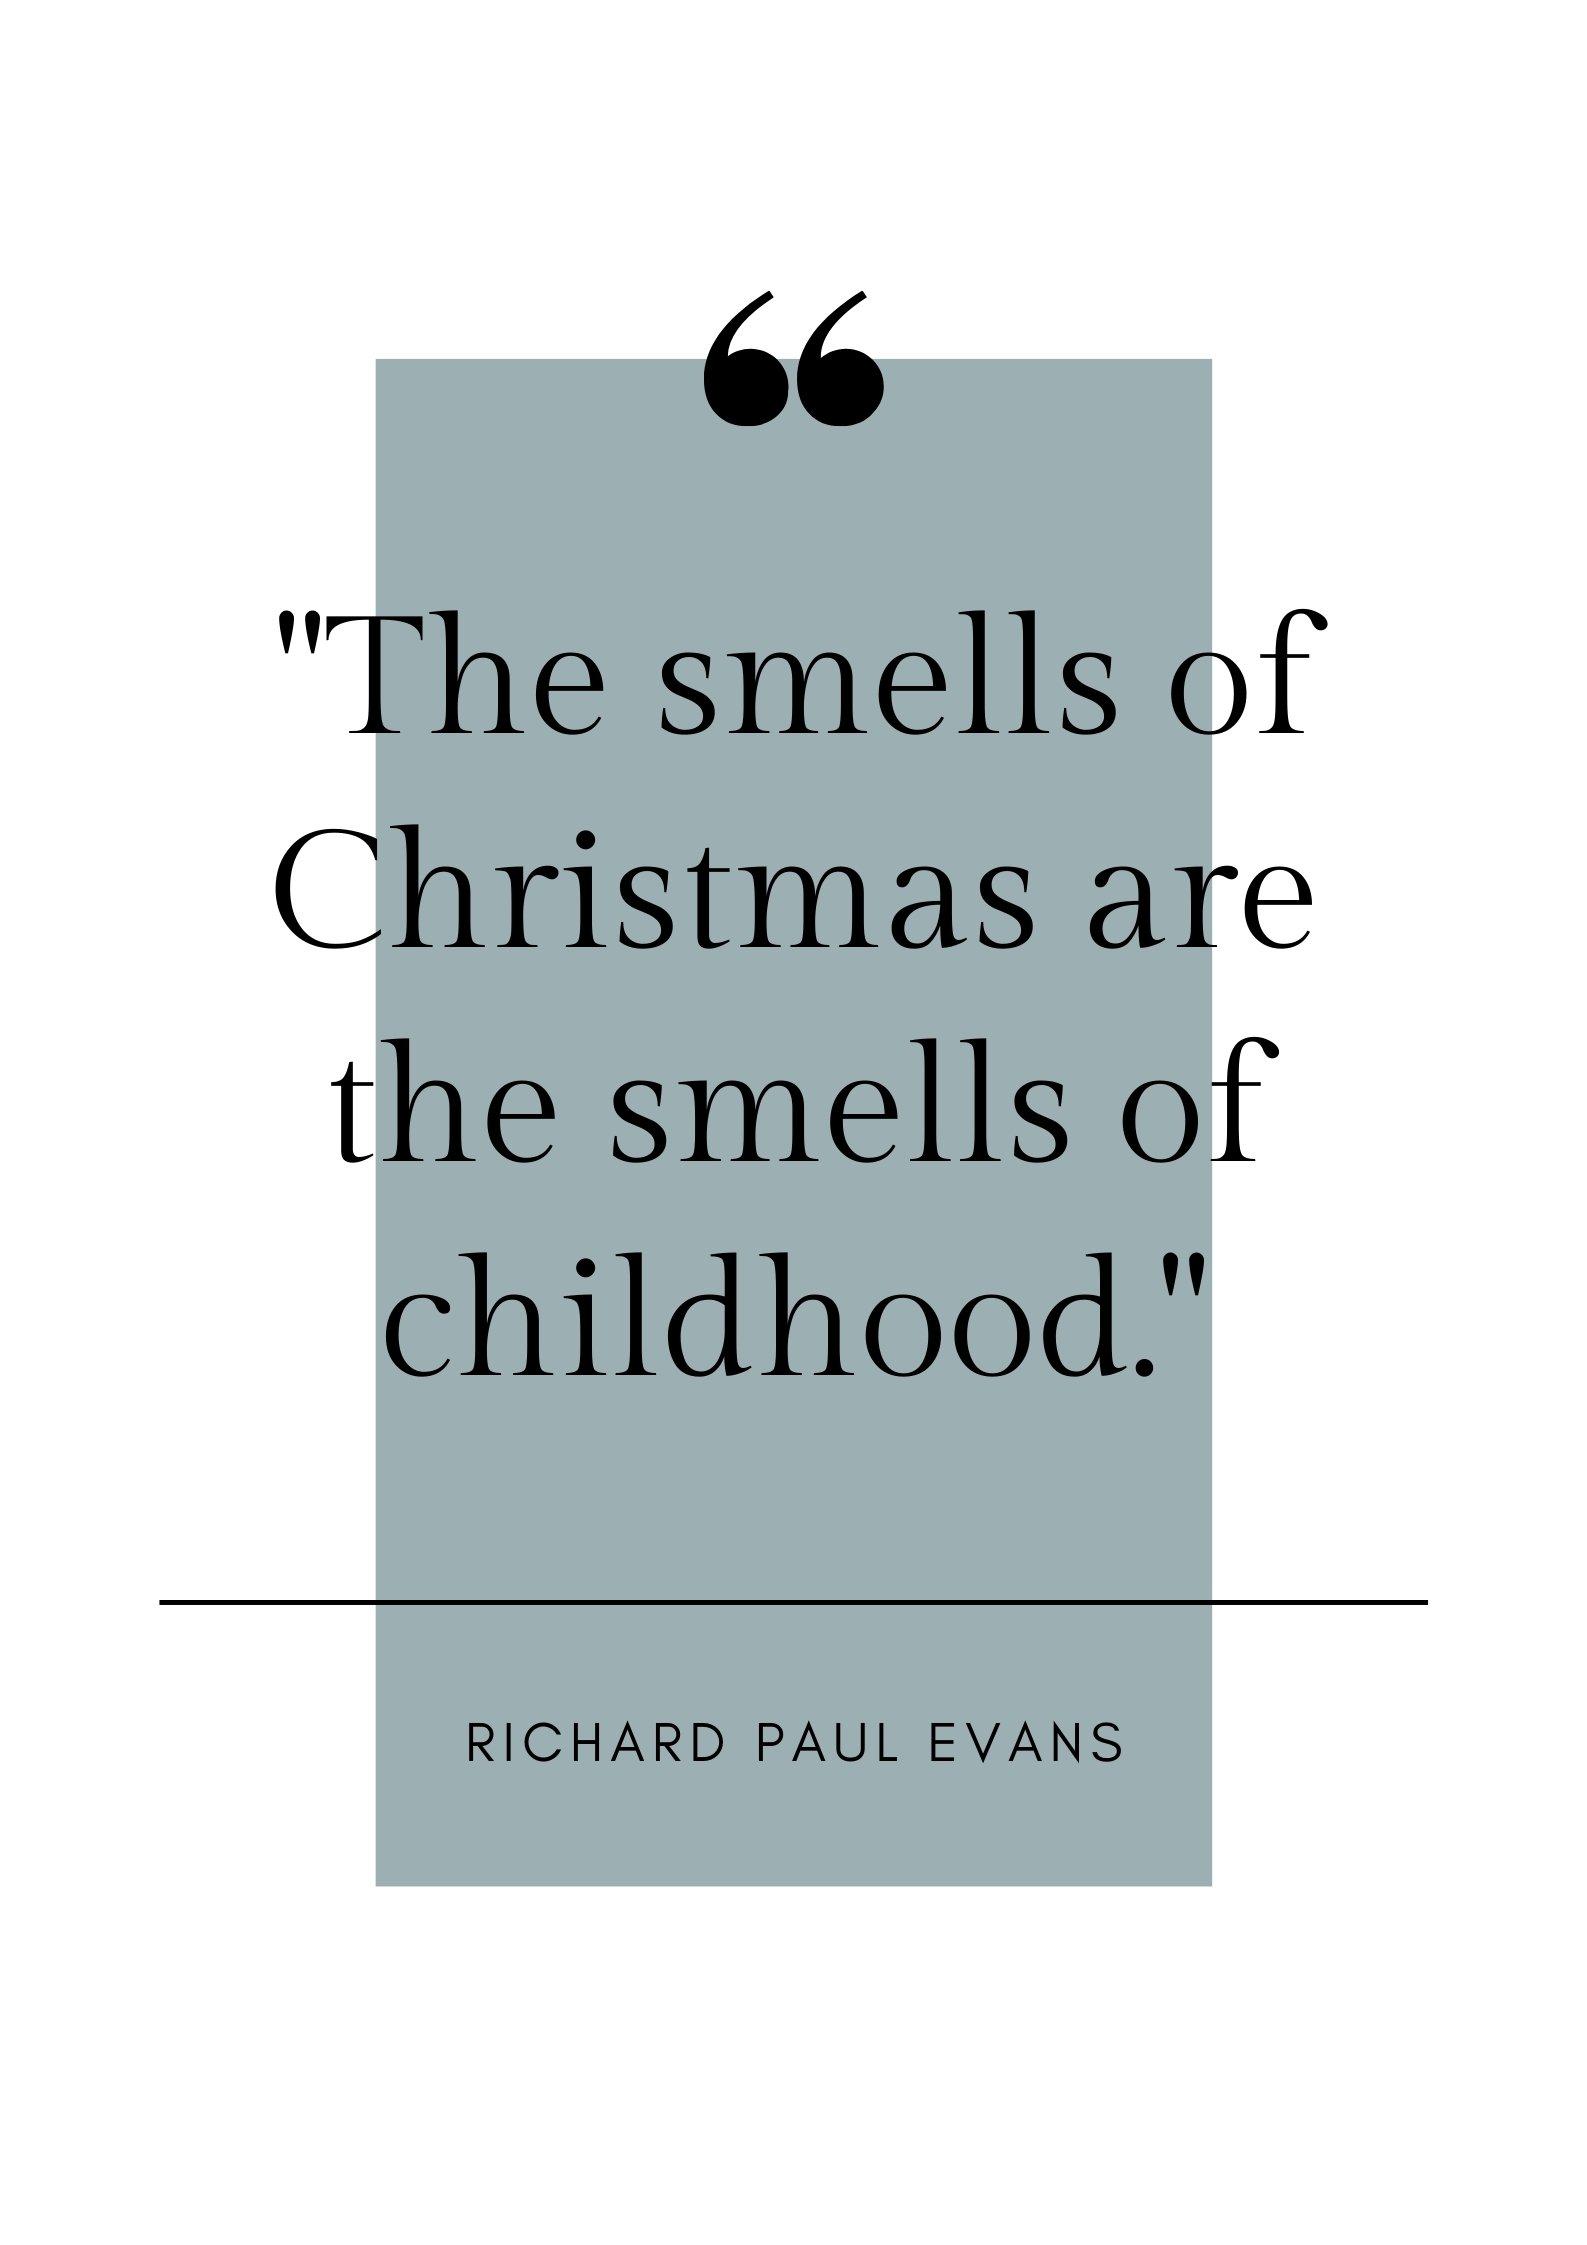 richard paul evans quote